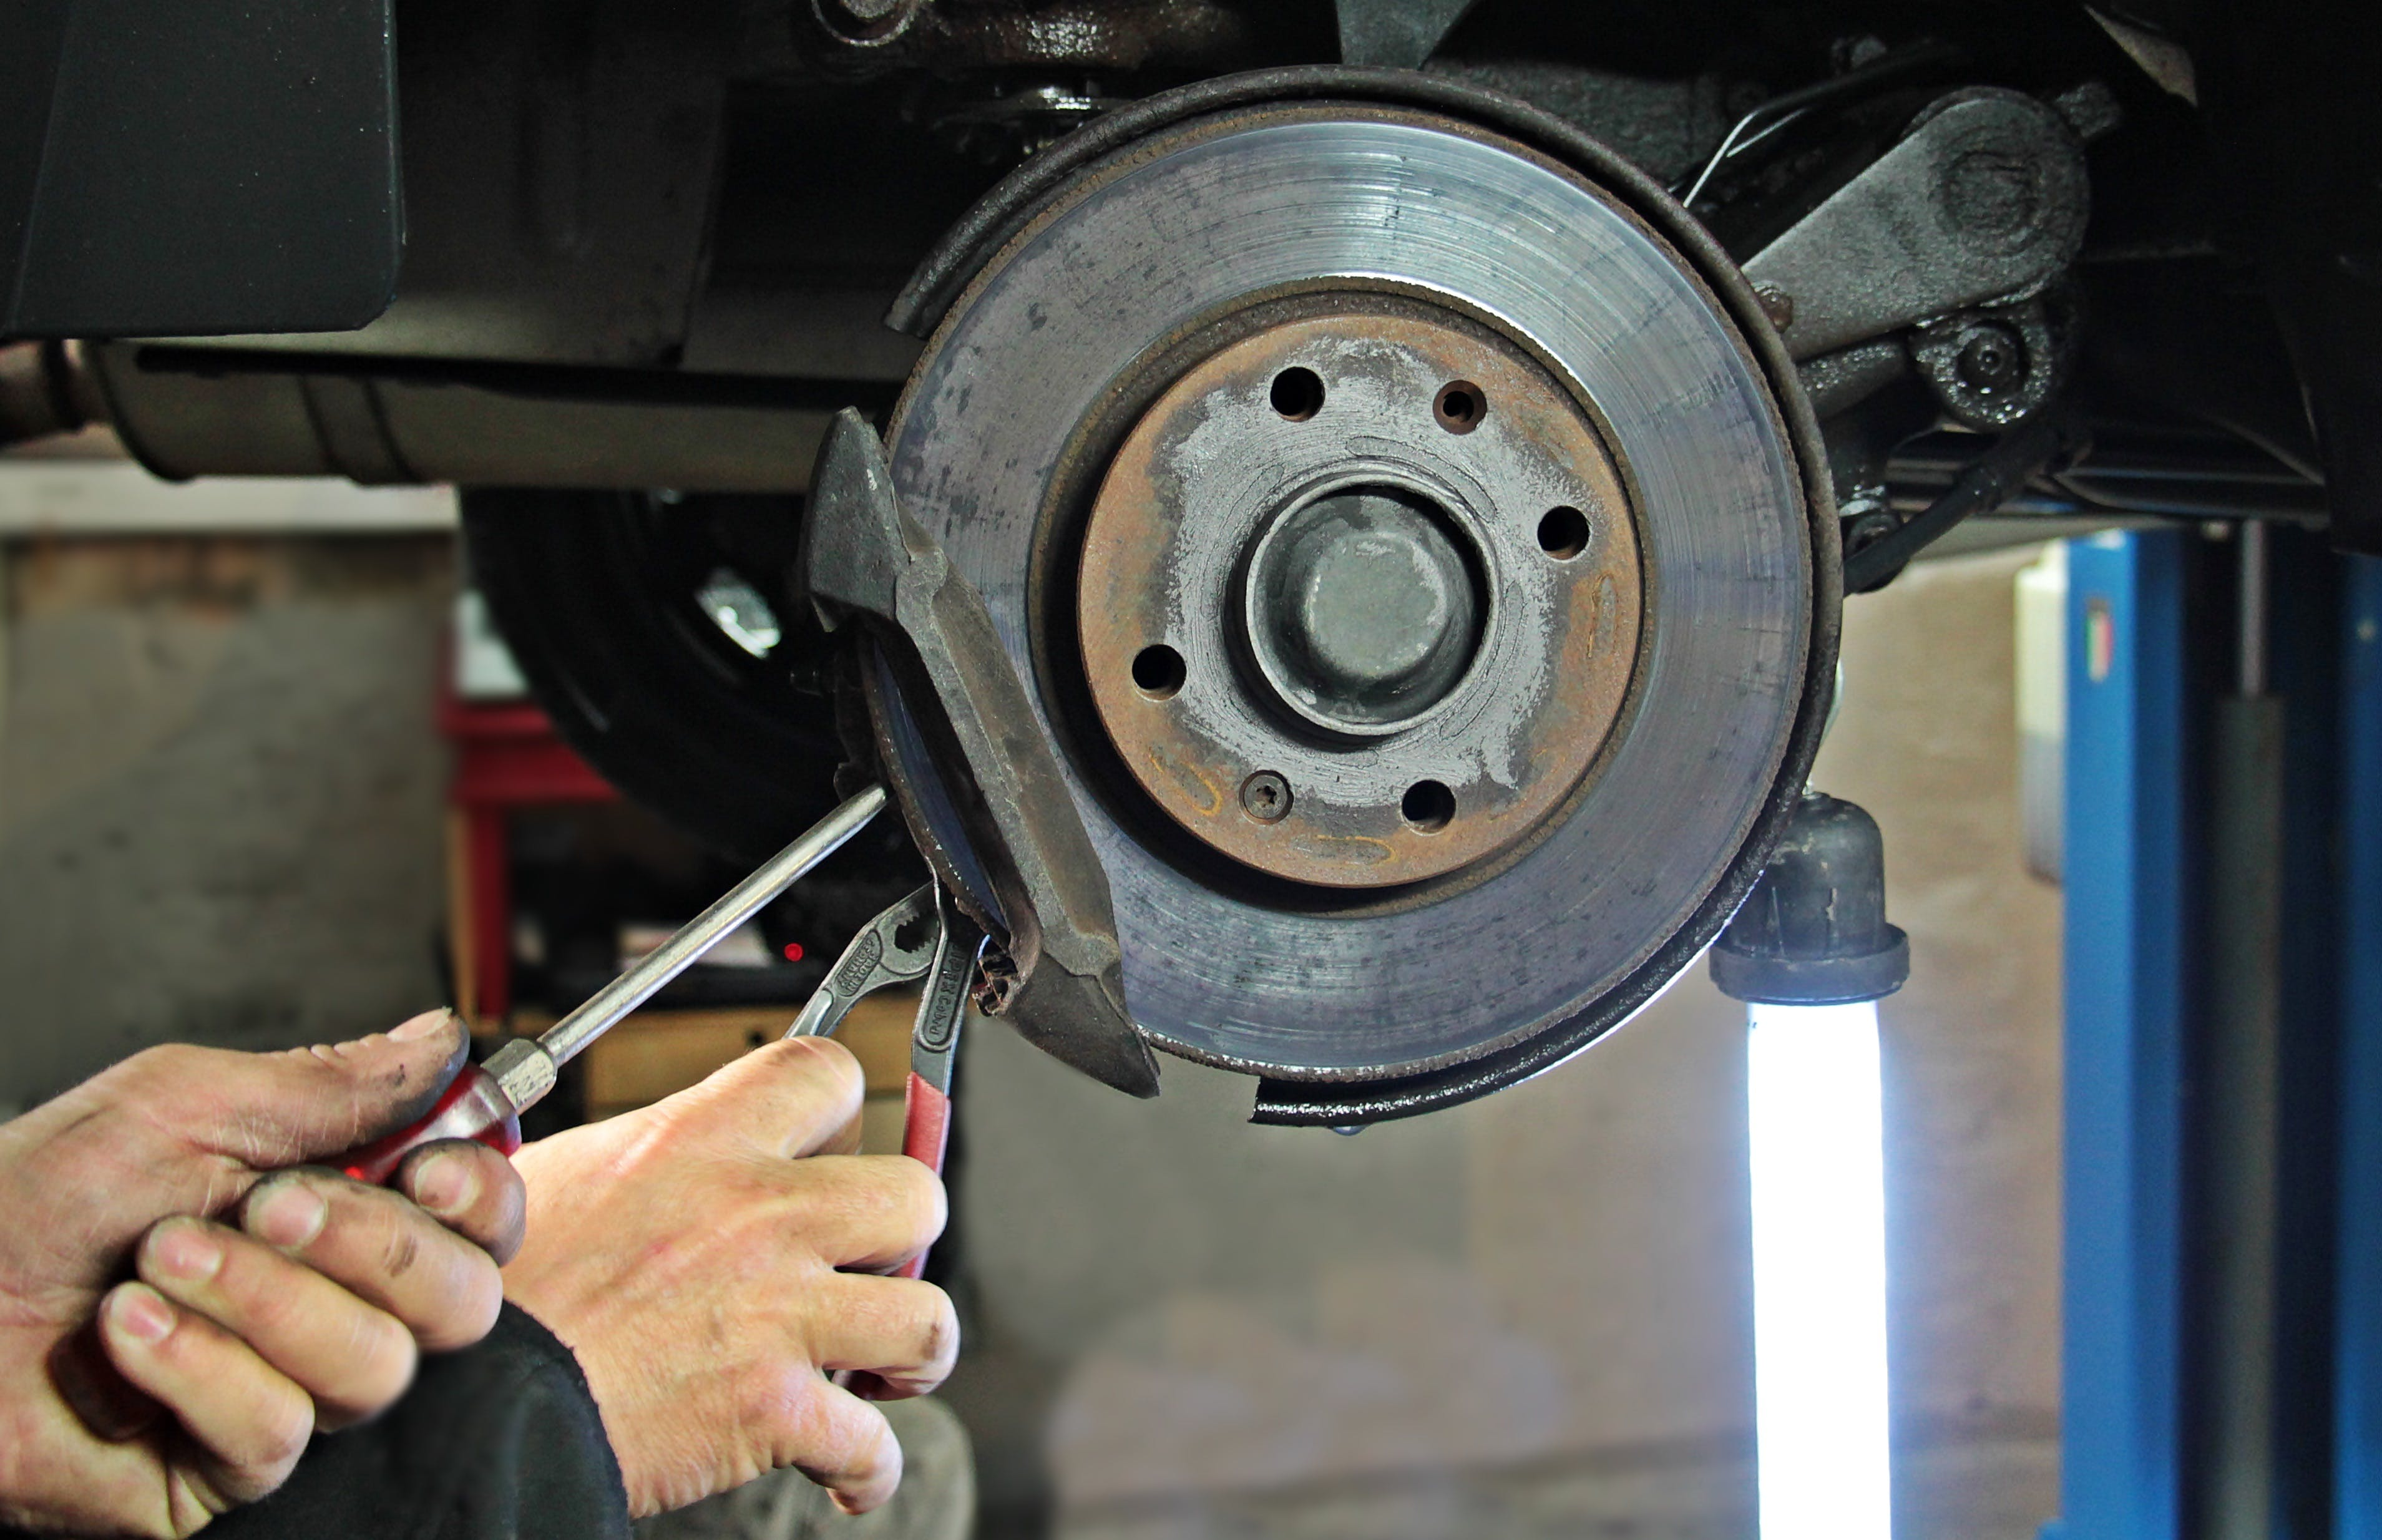 Free stock photo of vehicle, lamp, professional, work